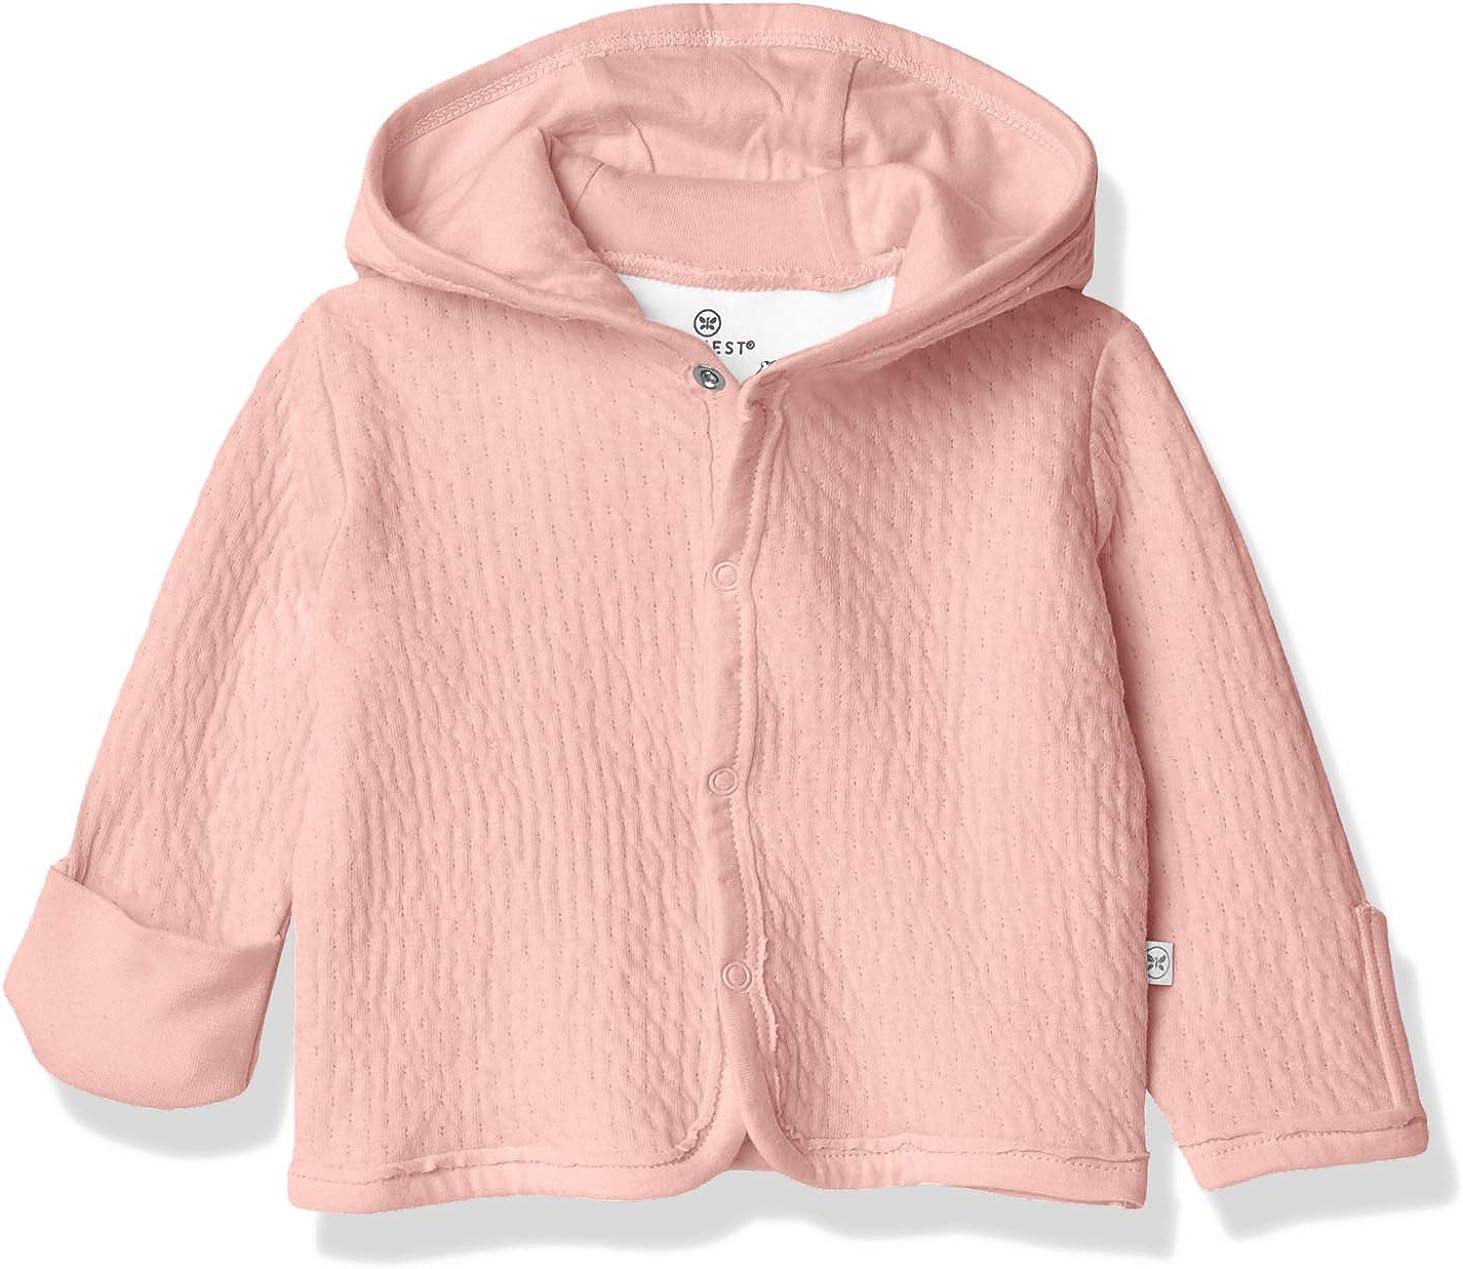 HonestBaby Baby Girls' Organic Cotton Matelasse Snap-Front Hooded Jacket